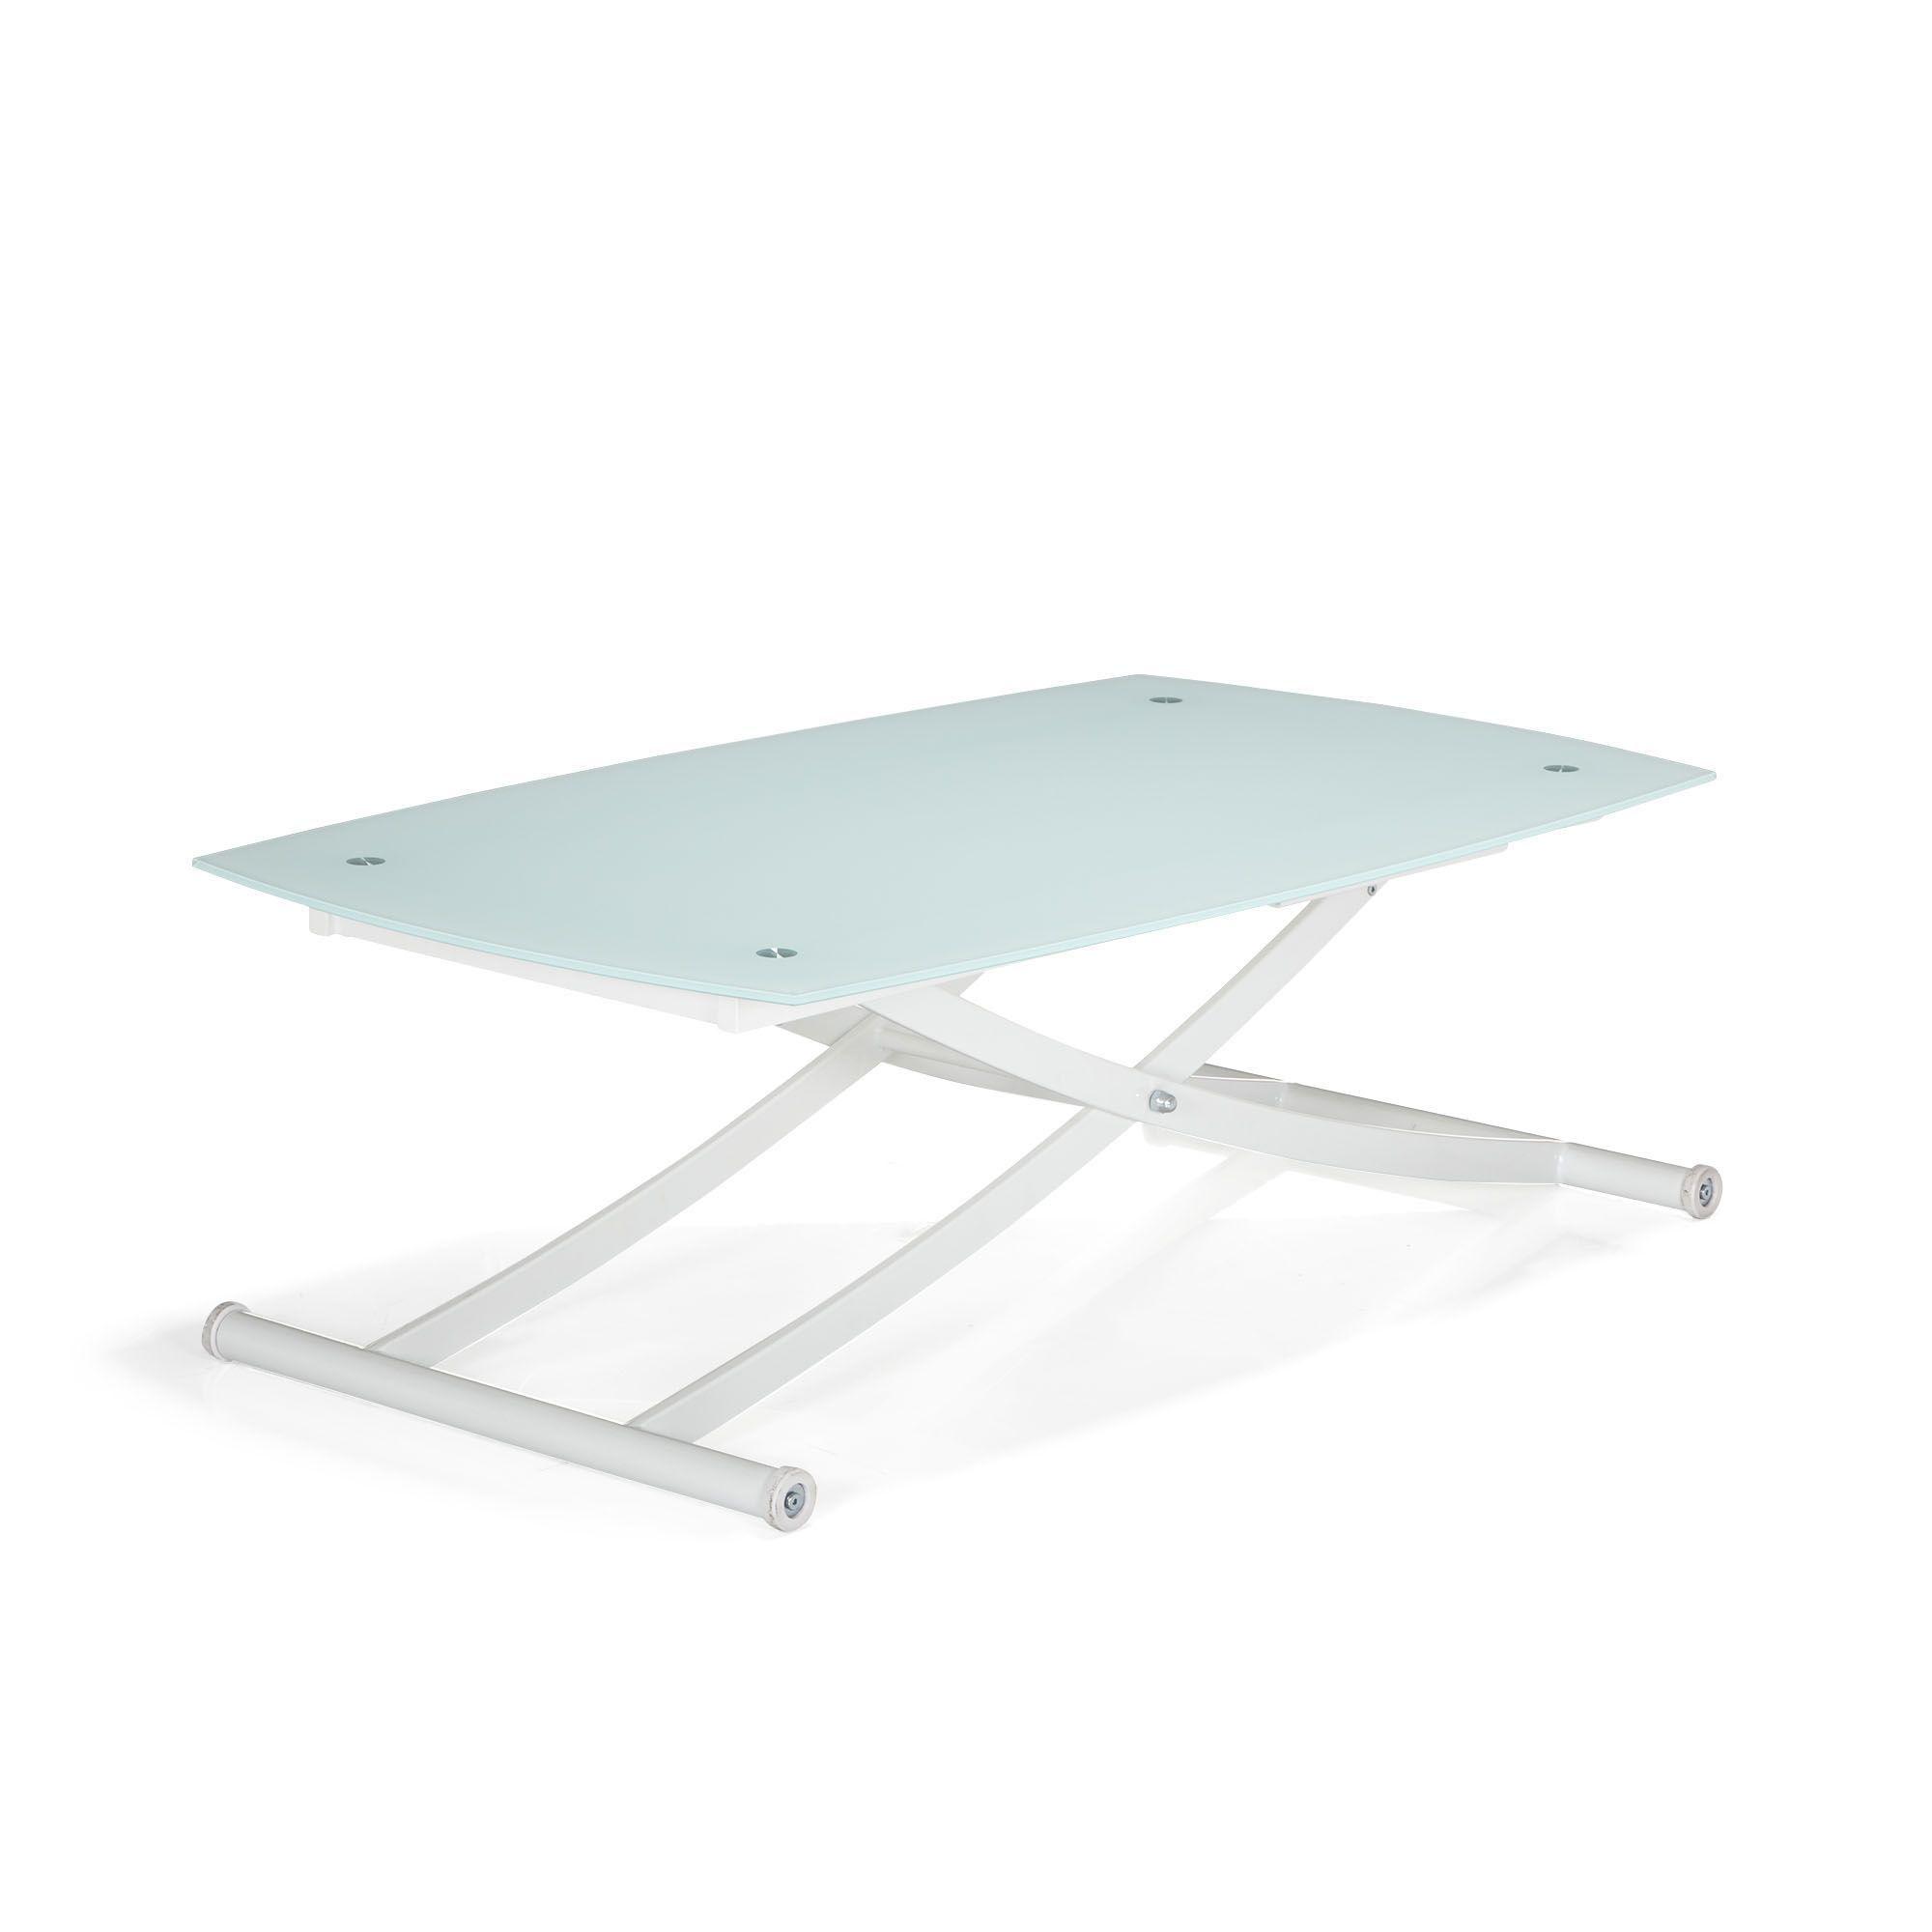 793912a8660b3541e6790f21fea1f3fc Impressionnant De Table ascenseur Des Idées